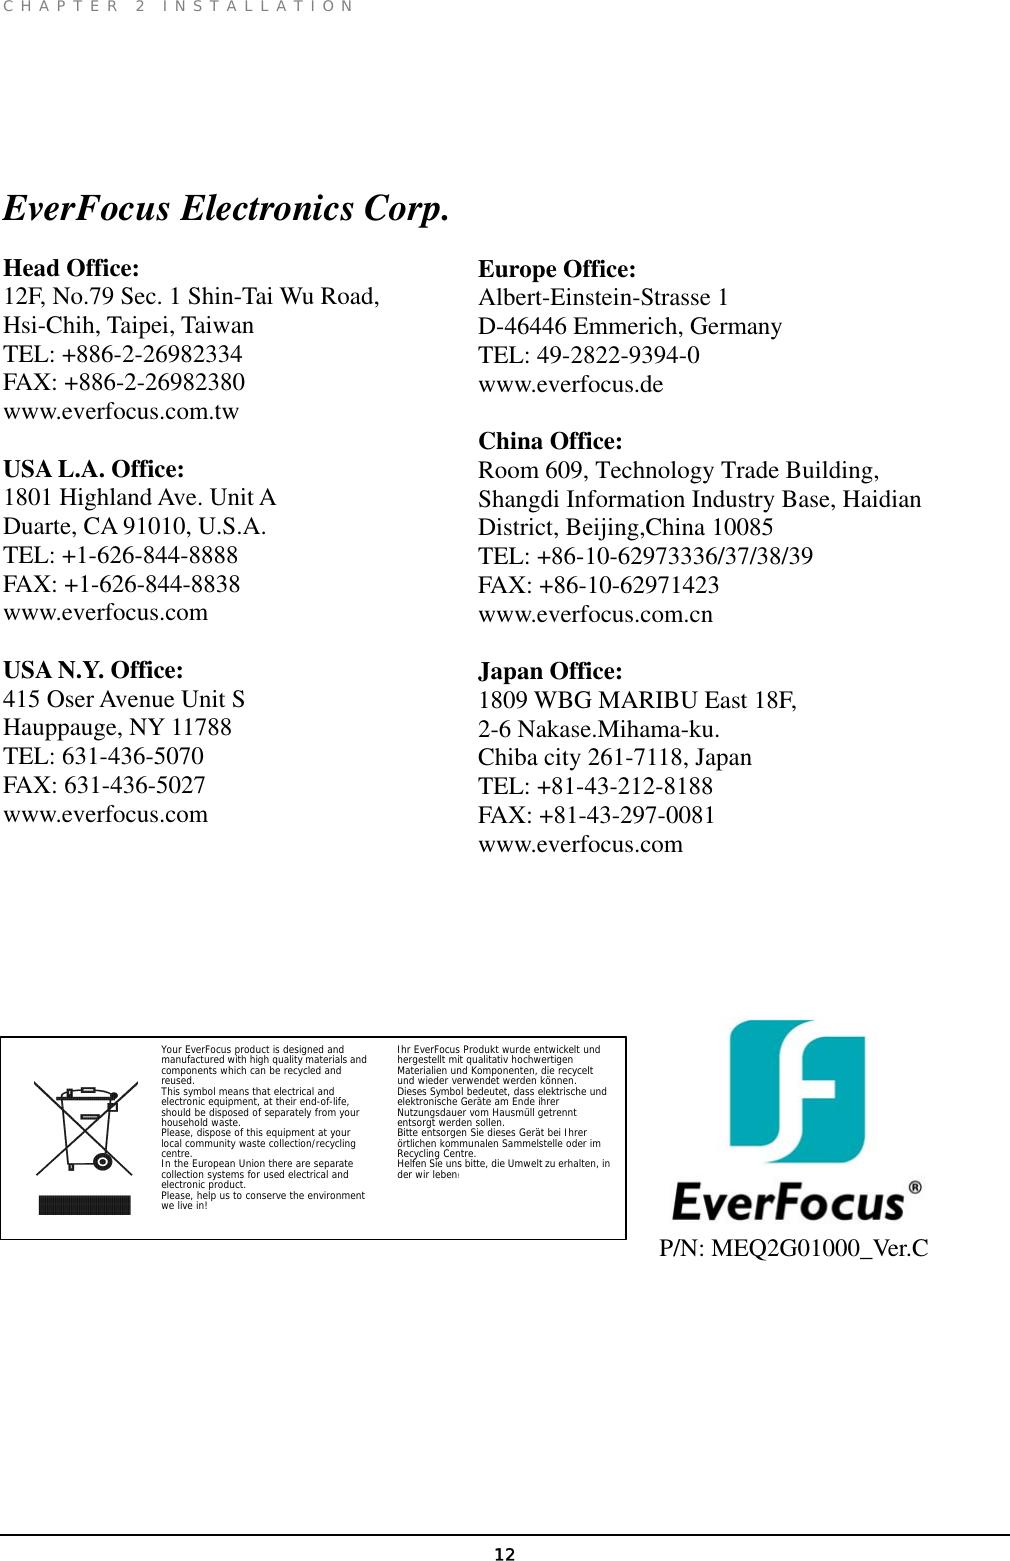 Everfocus Eq200E Users Manual EQ300E_200E MEQ2G01000_Ver.C rich ...